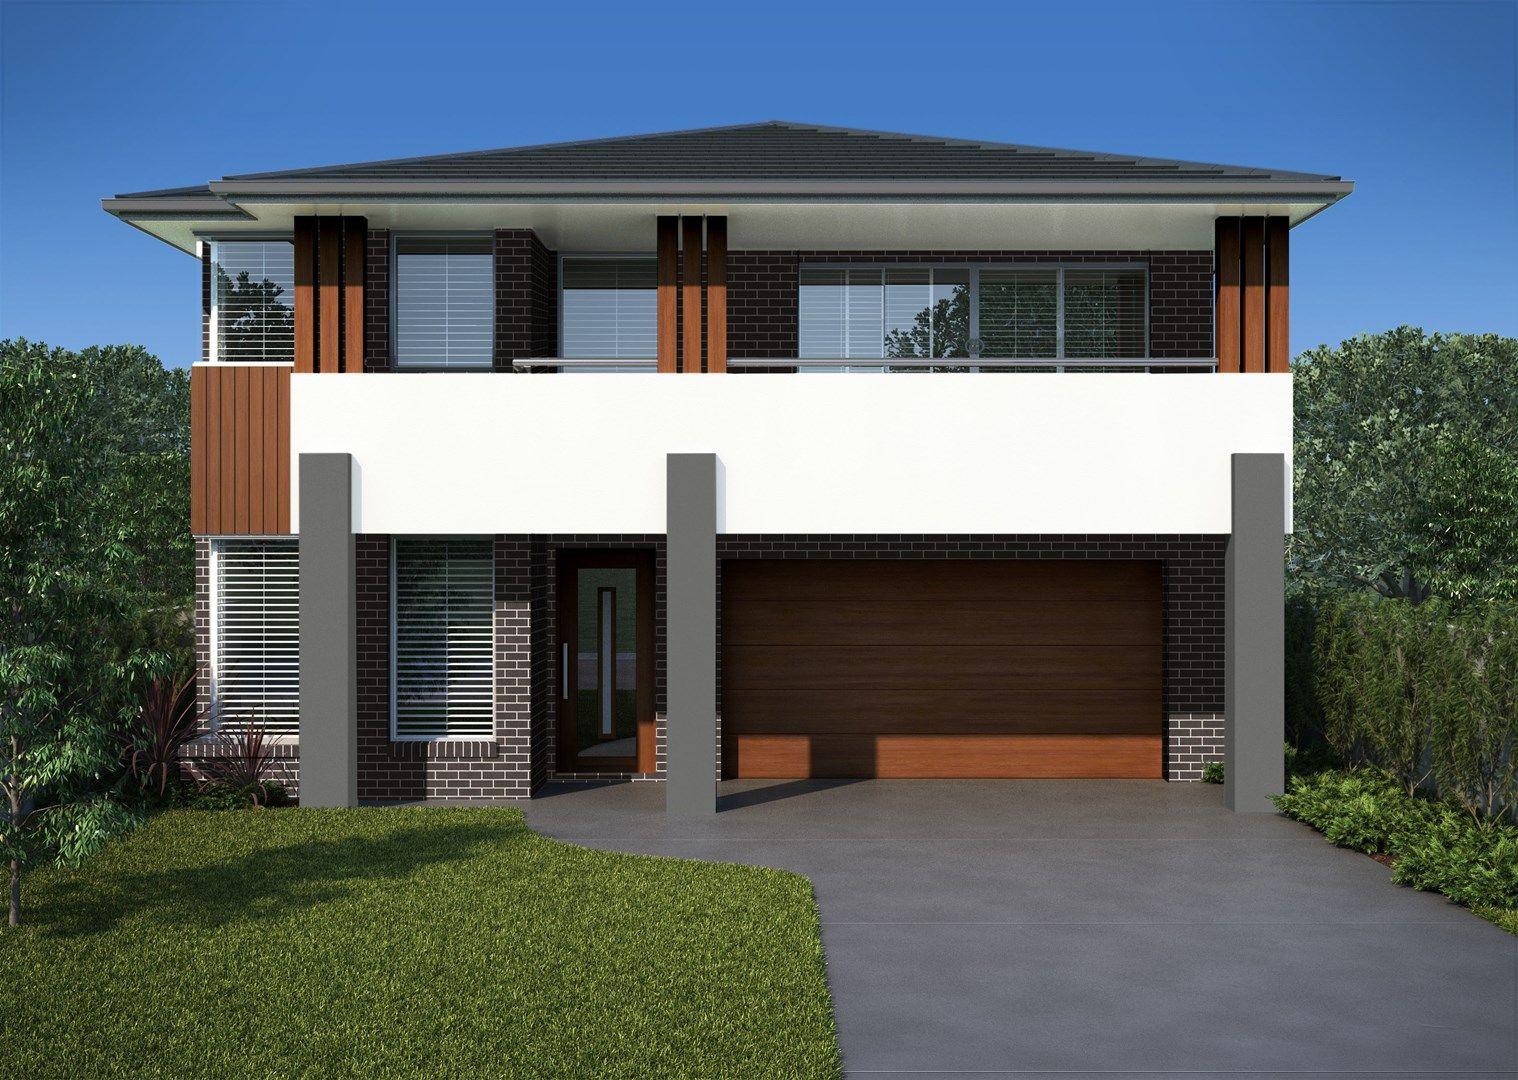 Lot 109 Talana Hill Drive, Edmondson Park NSW 2174, Image 0